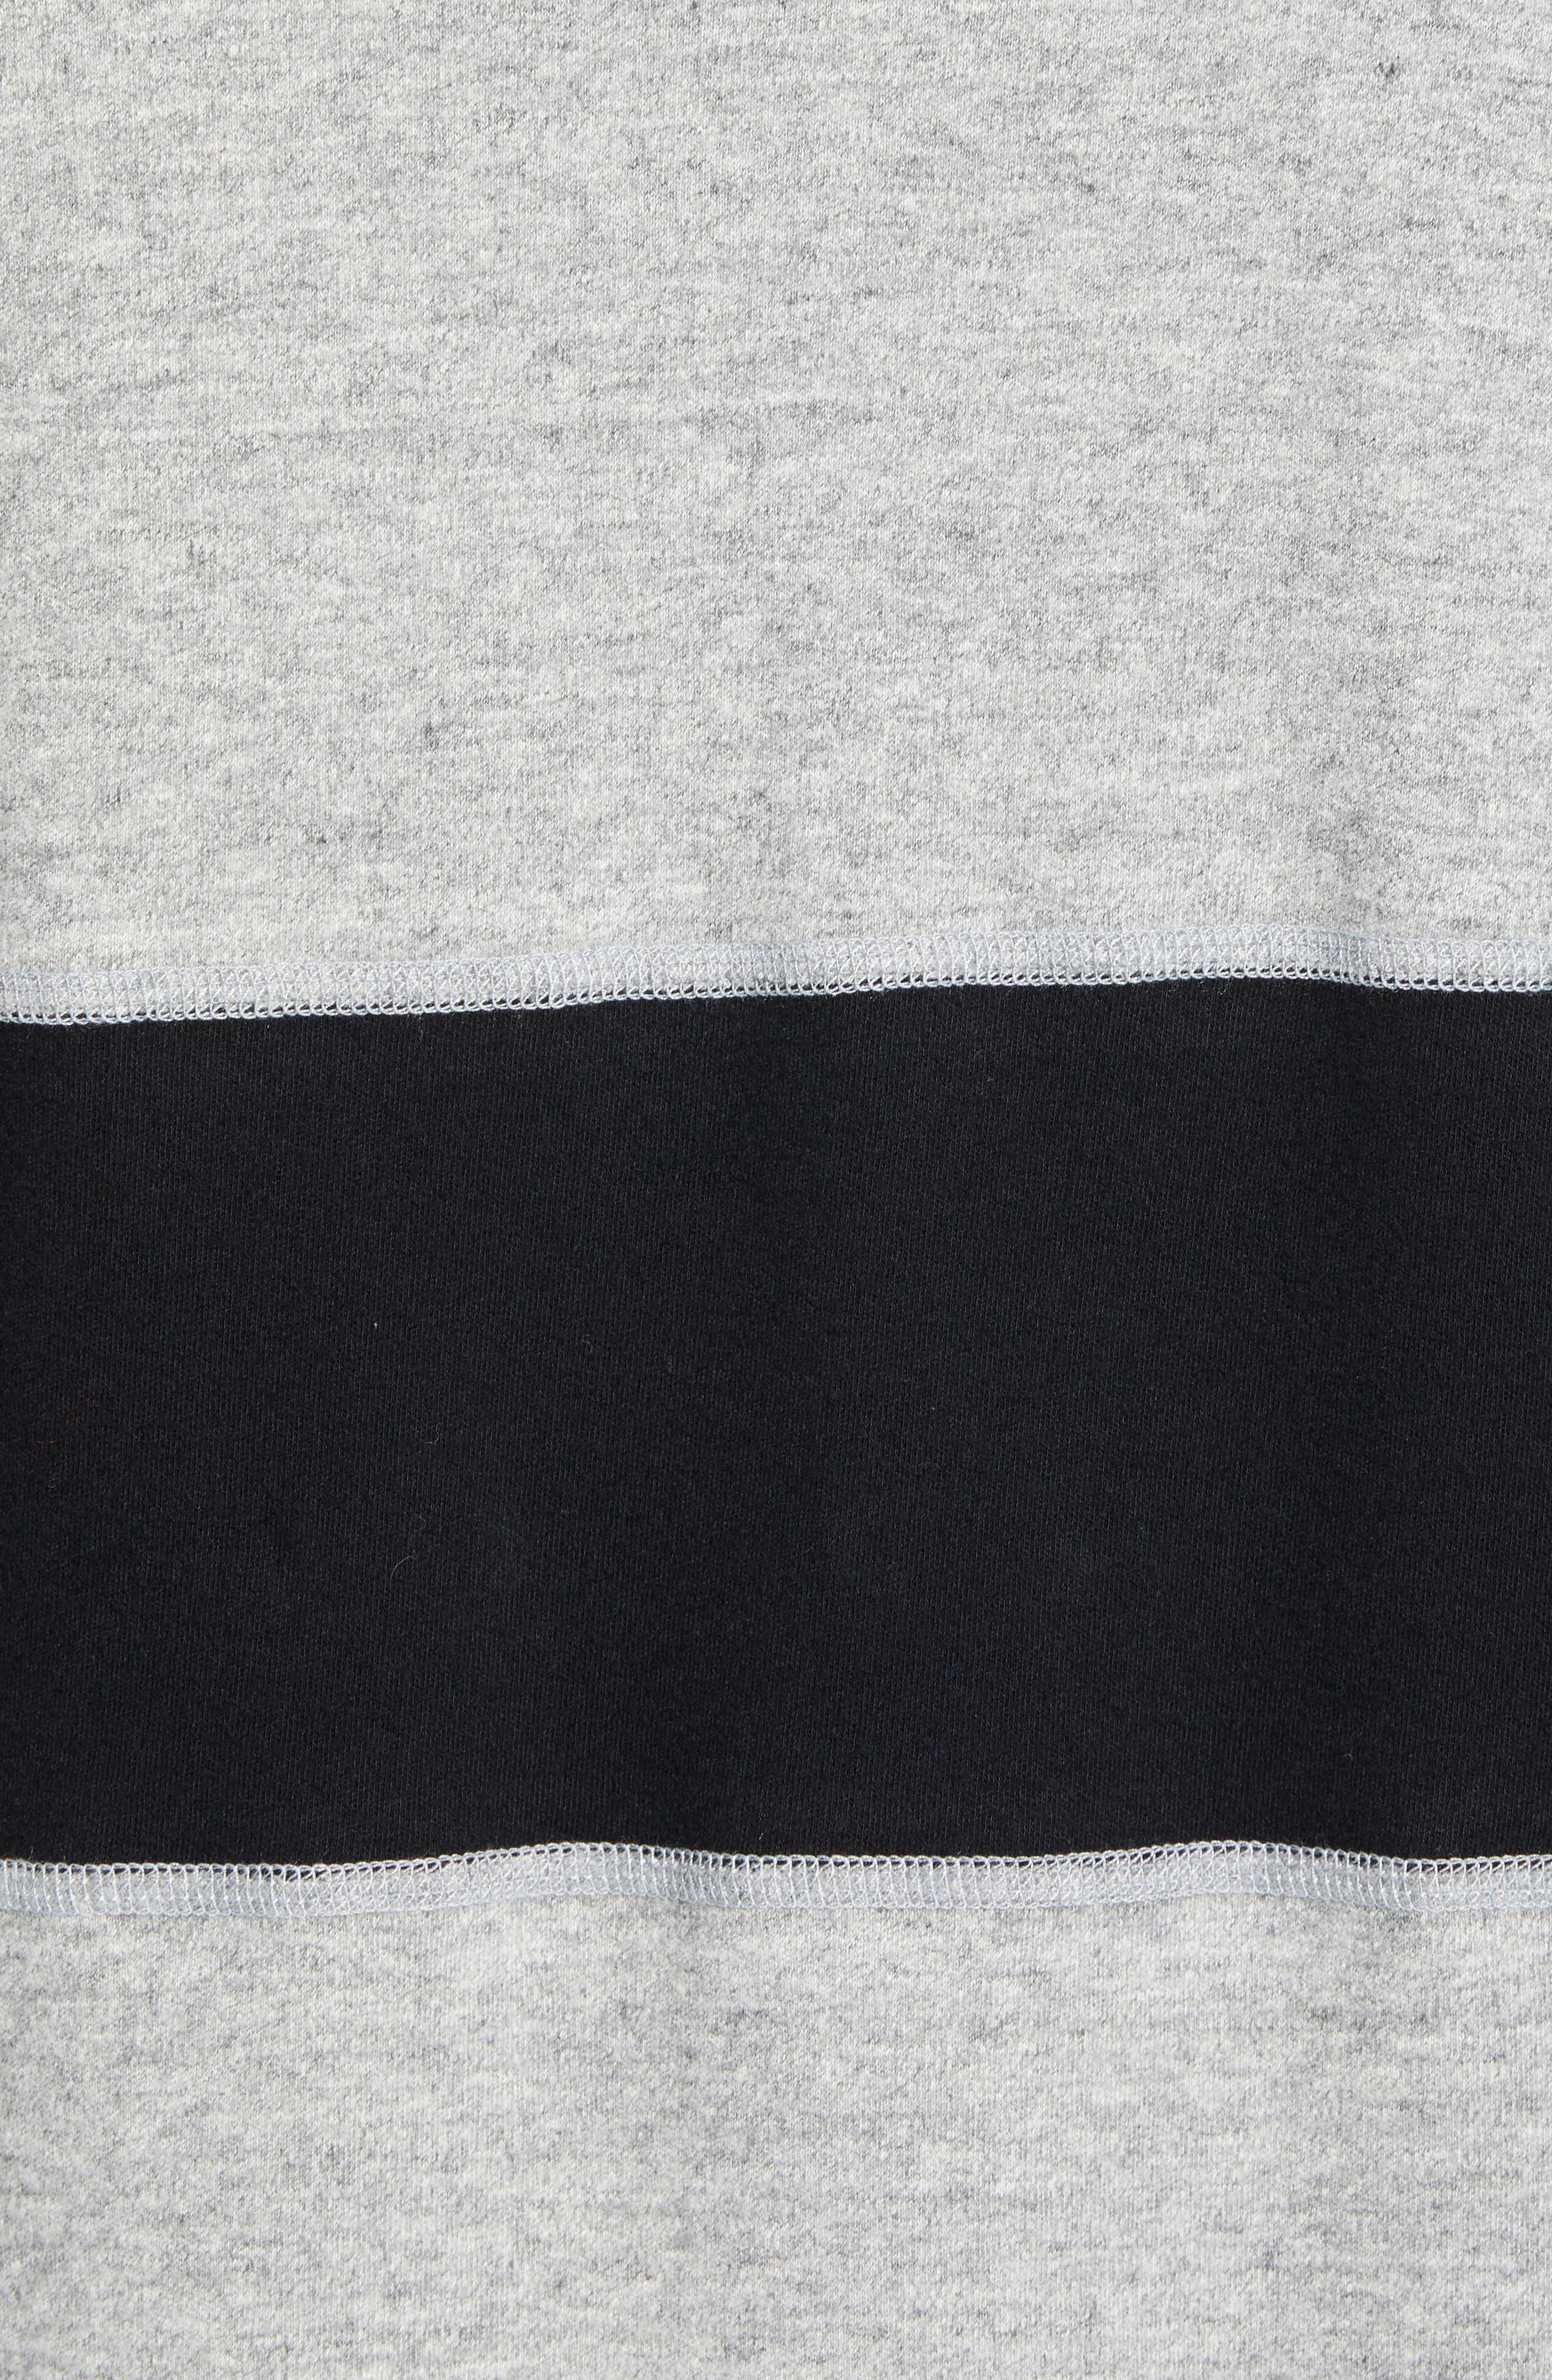 REIGNING CHAMP, Rugby Crewneck Sweatshirt, Alternate thumbnail 5, color, MEDIUM GREY/ BLACK